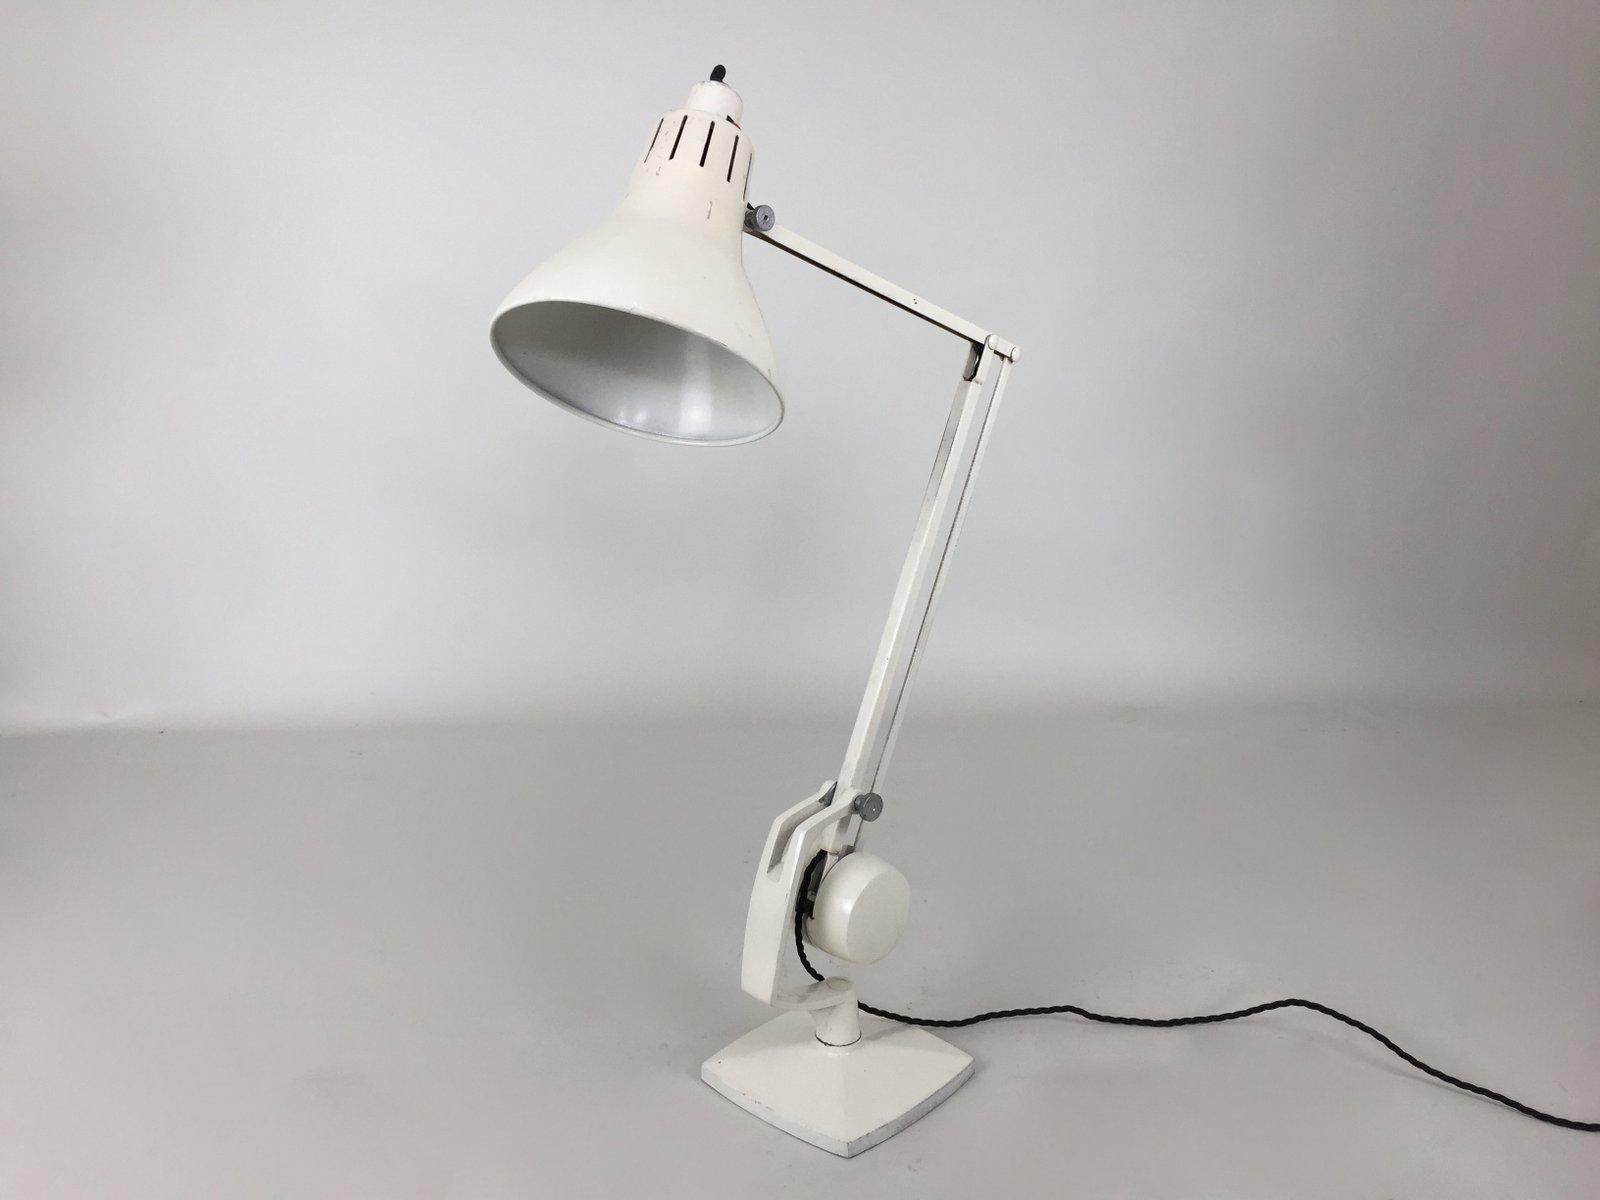 British Industrial Desk Lamp From Hadrill Horstman, 1950s